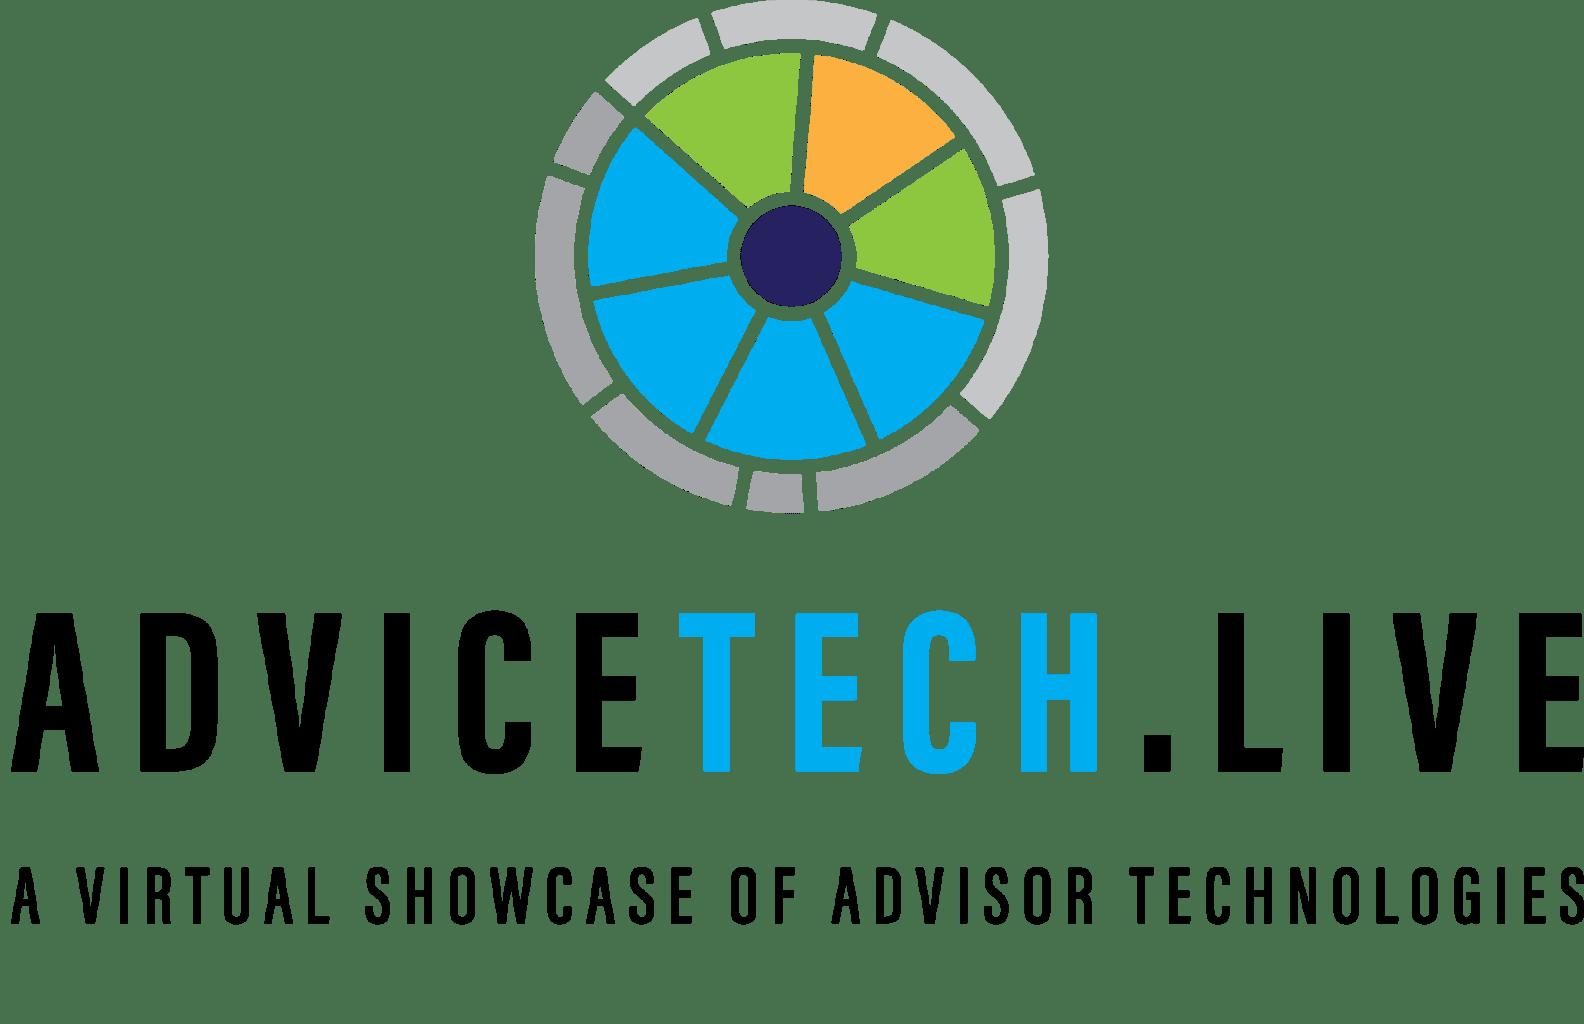 AdviceTech.LIVE logo